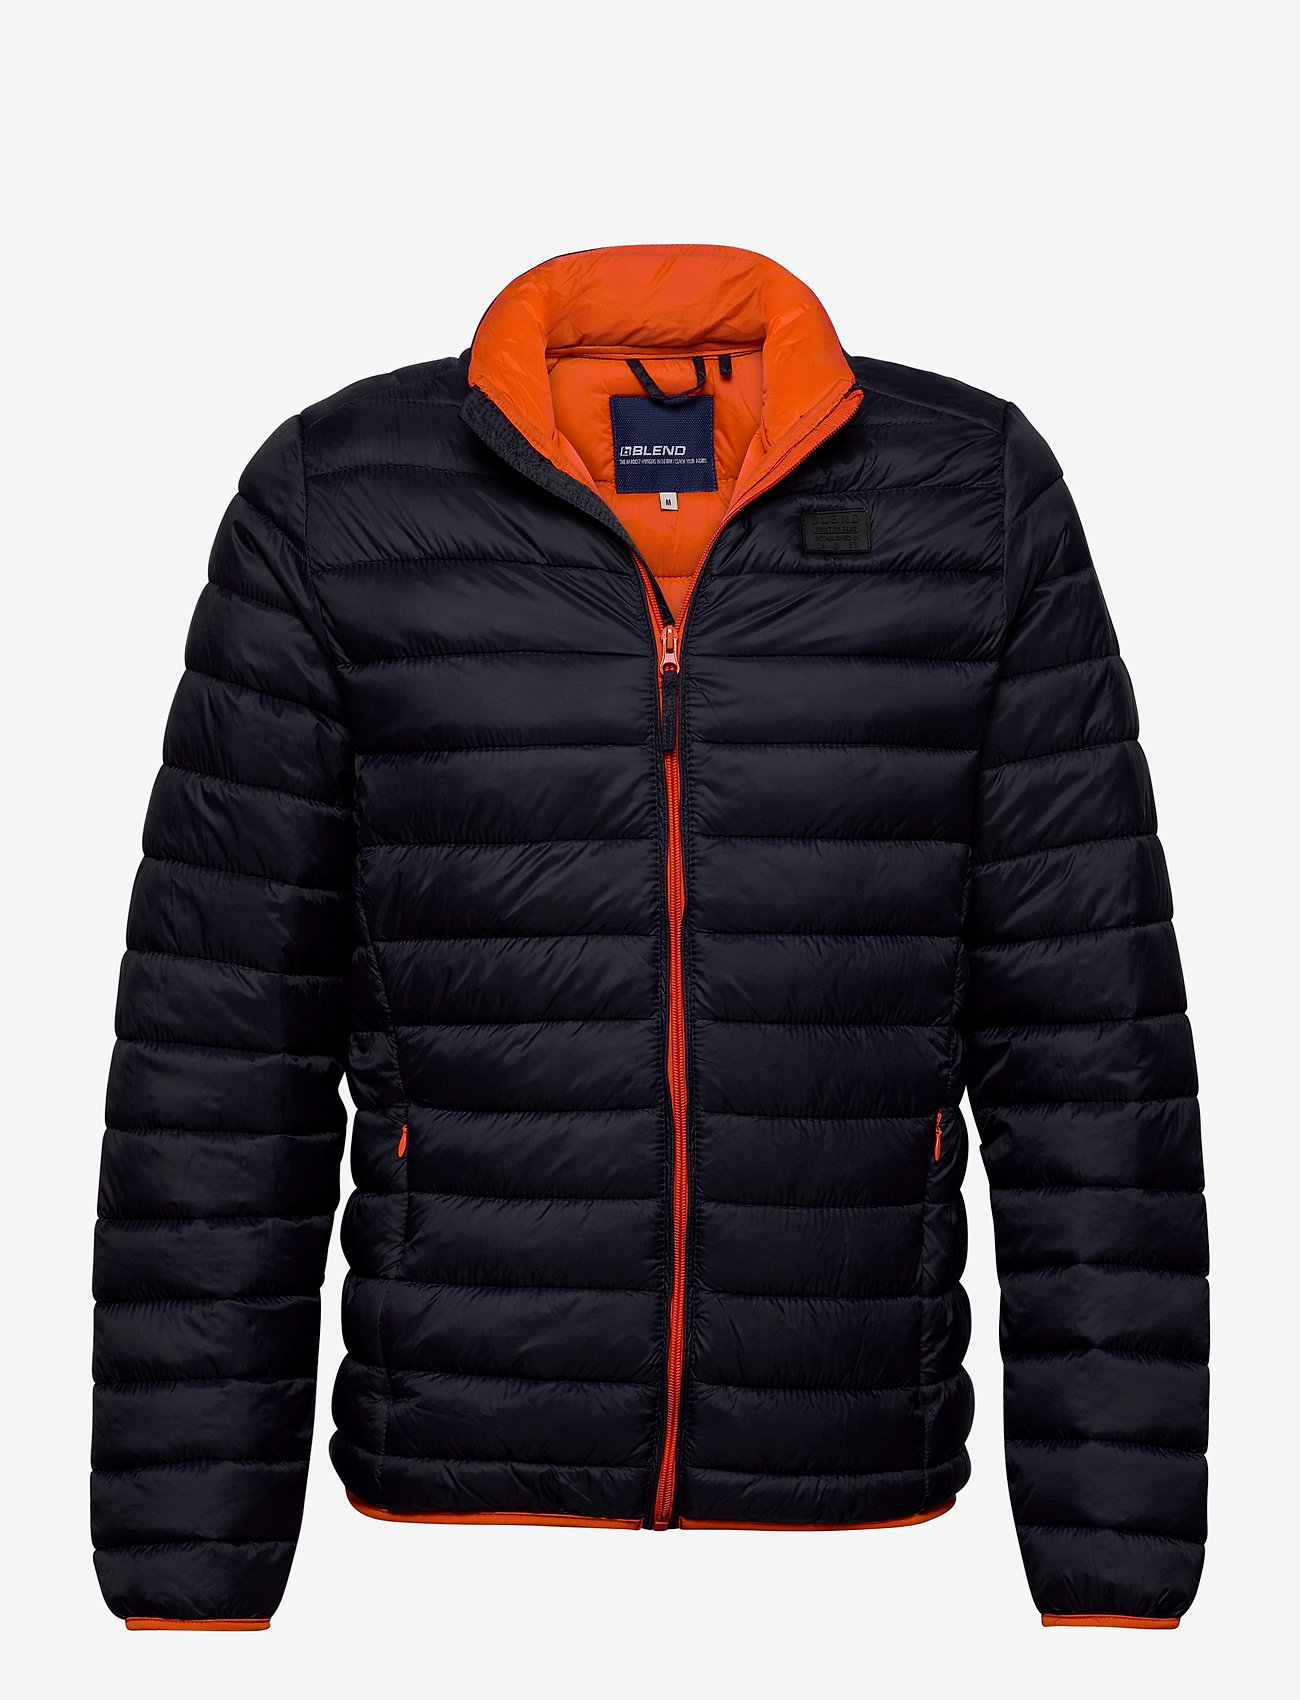 Blend - Outerwear - vestes matelassées - dark navy - 0